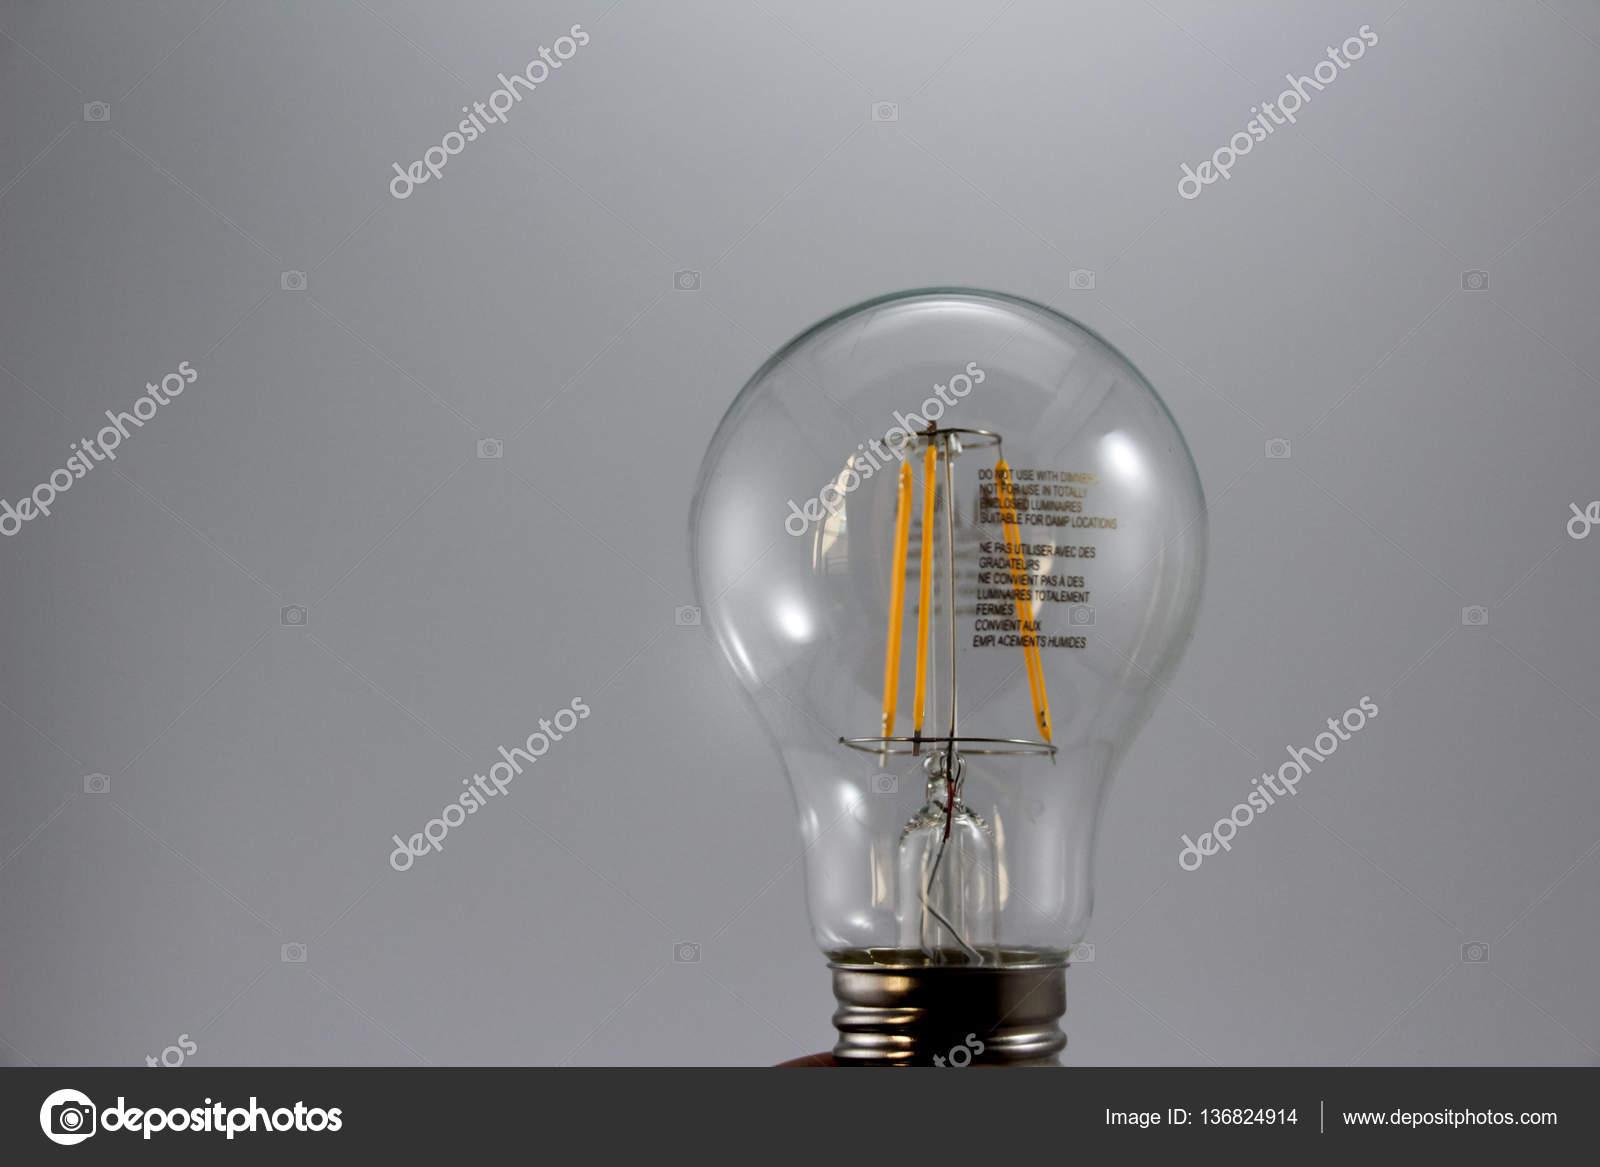 Kühlschrank Glühbirne Led : Led glühbirne licht u stockfoto bernardojbp